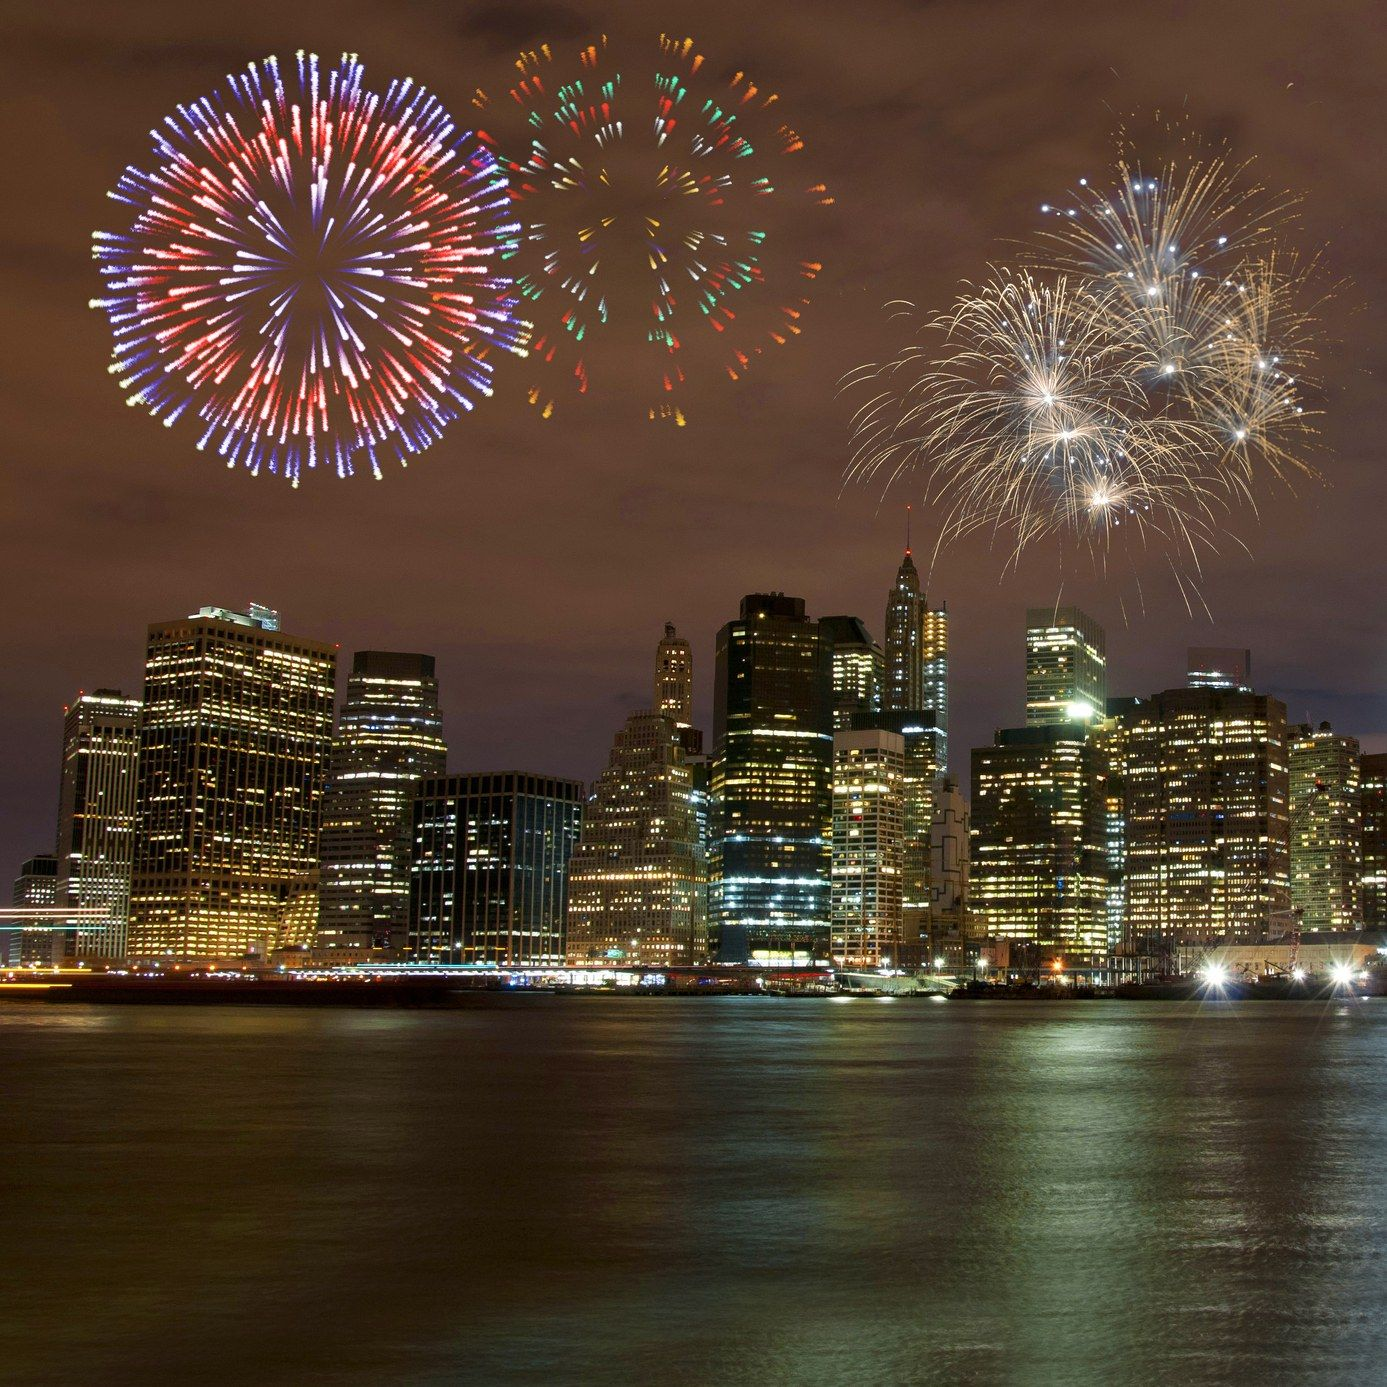 5 Best Italian Restaurants To Celebrate The New Year In Nyc Best Italian Restaurants Fireworks 4th Of July Fireworks